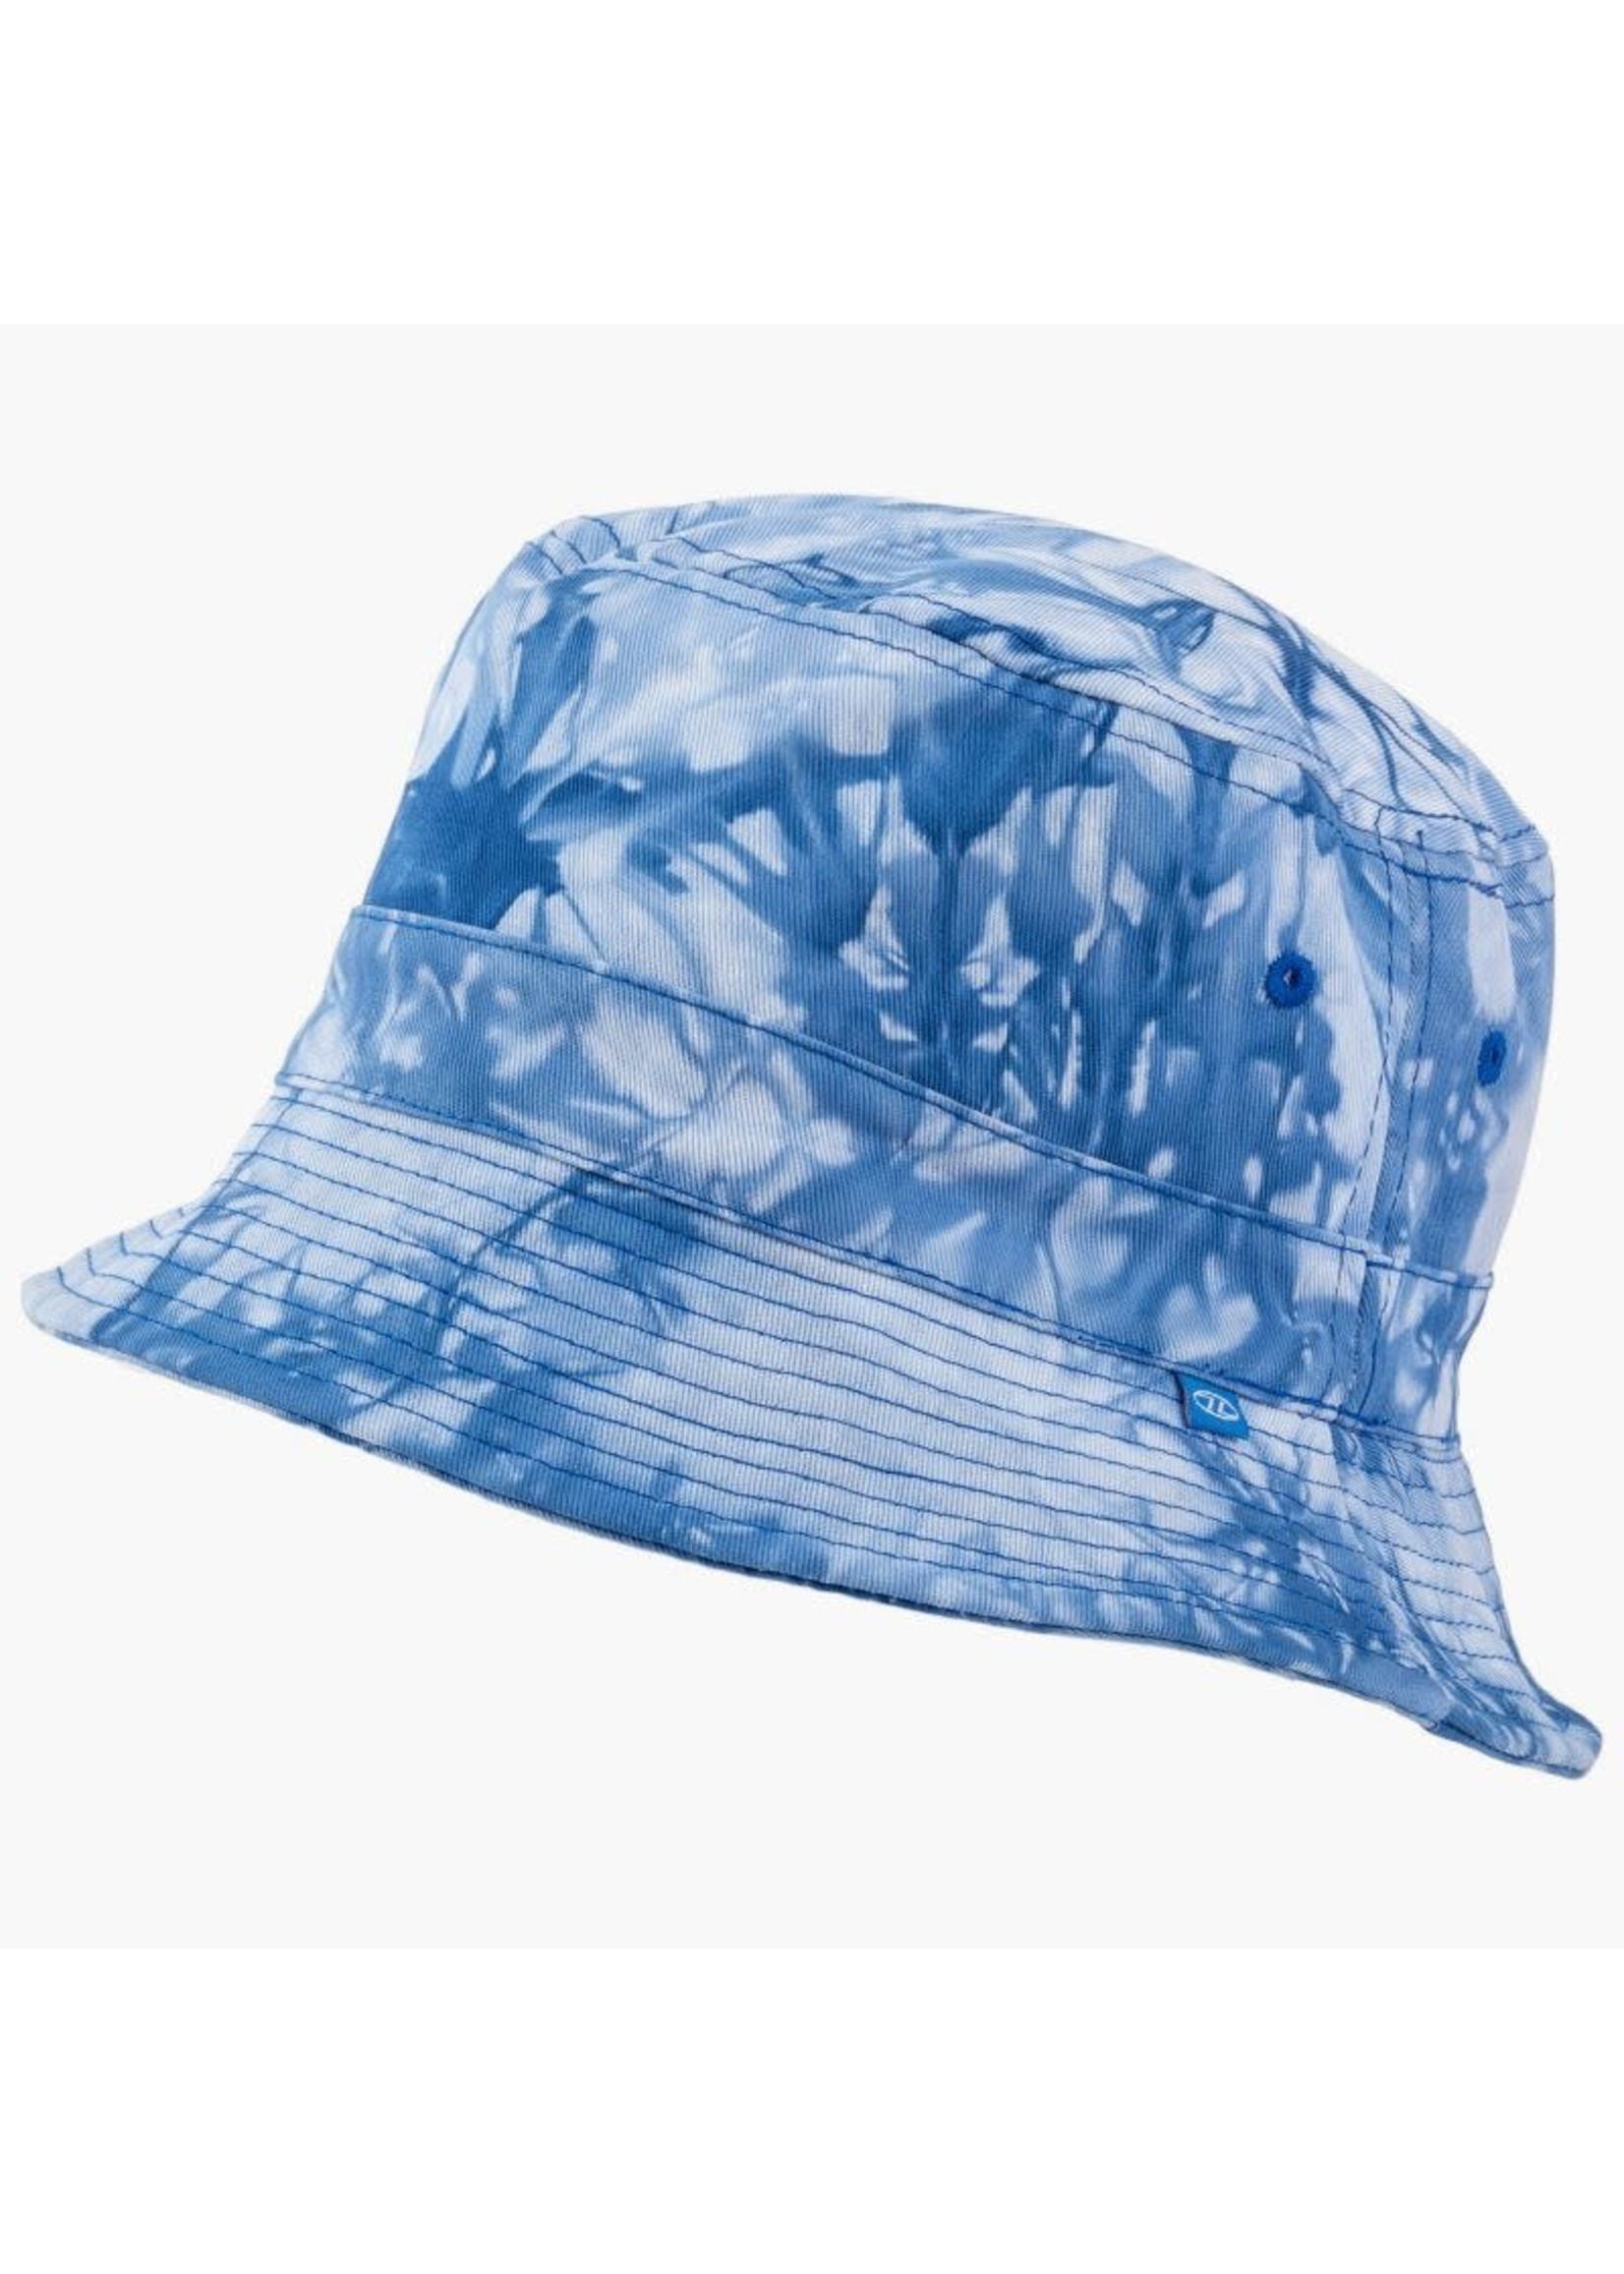 Highlander Highlander Bucket Sun Hat (2021) - Denim